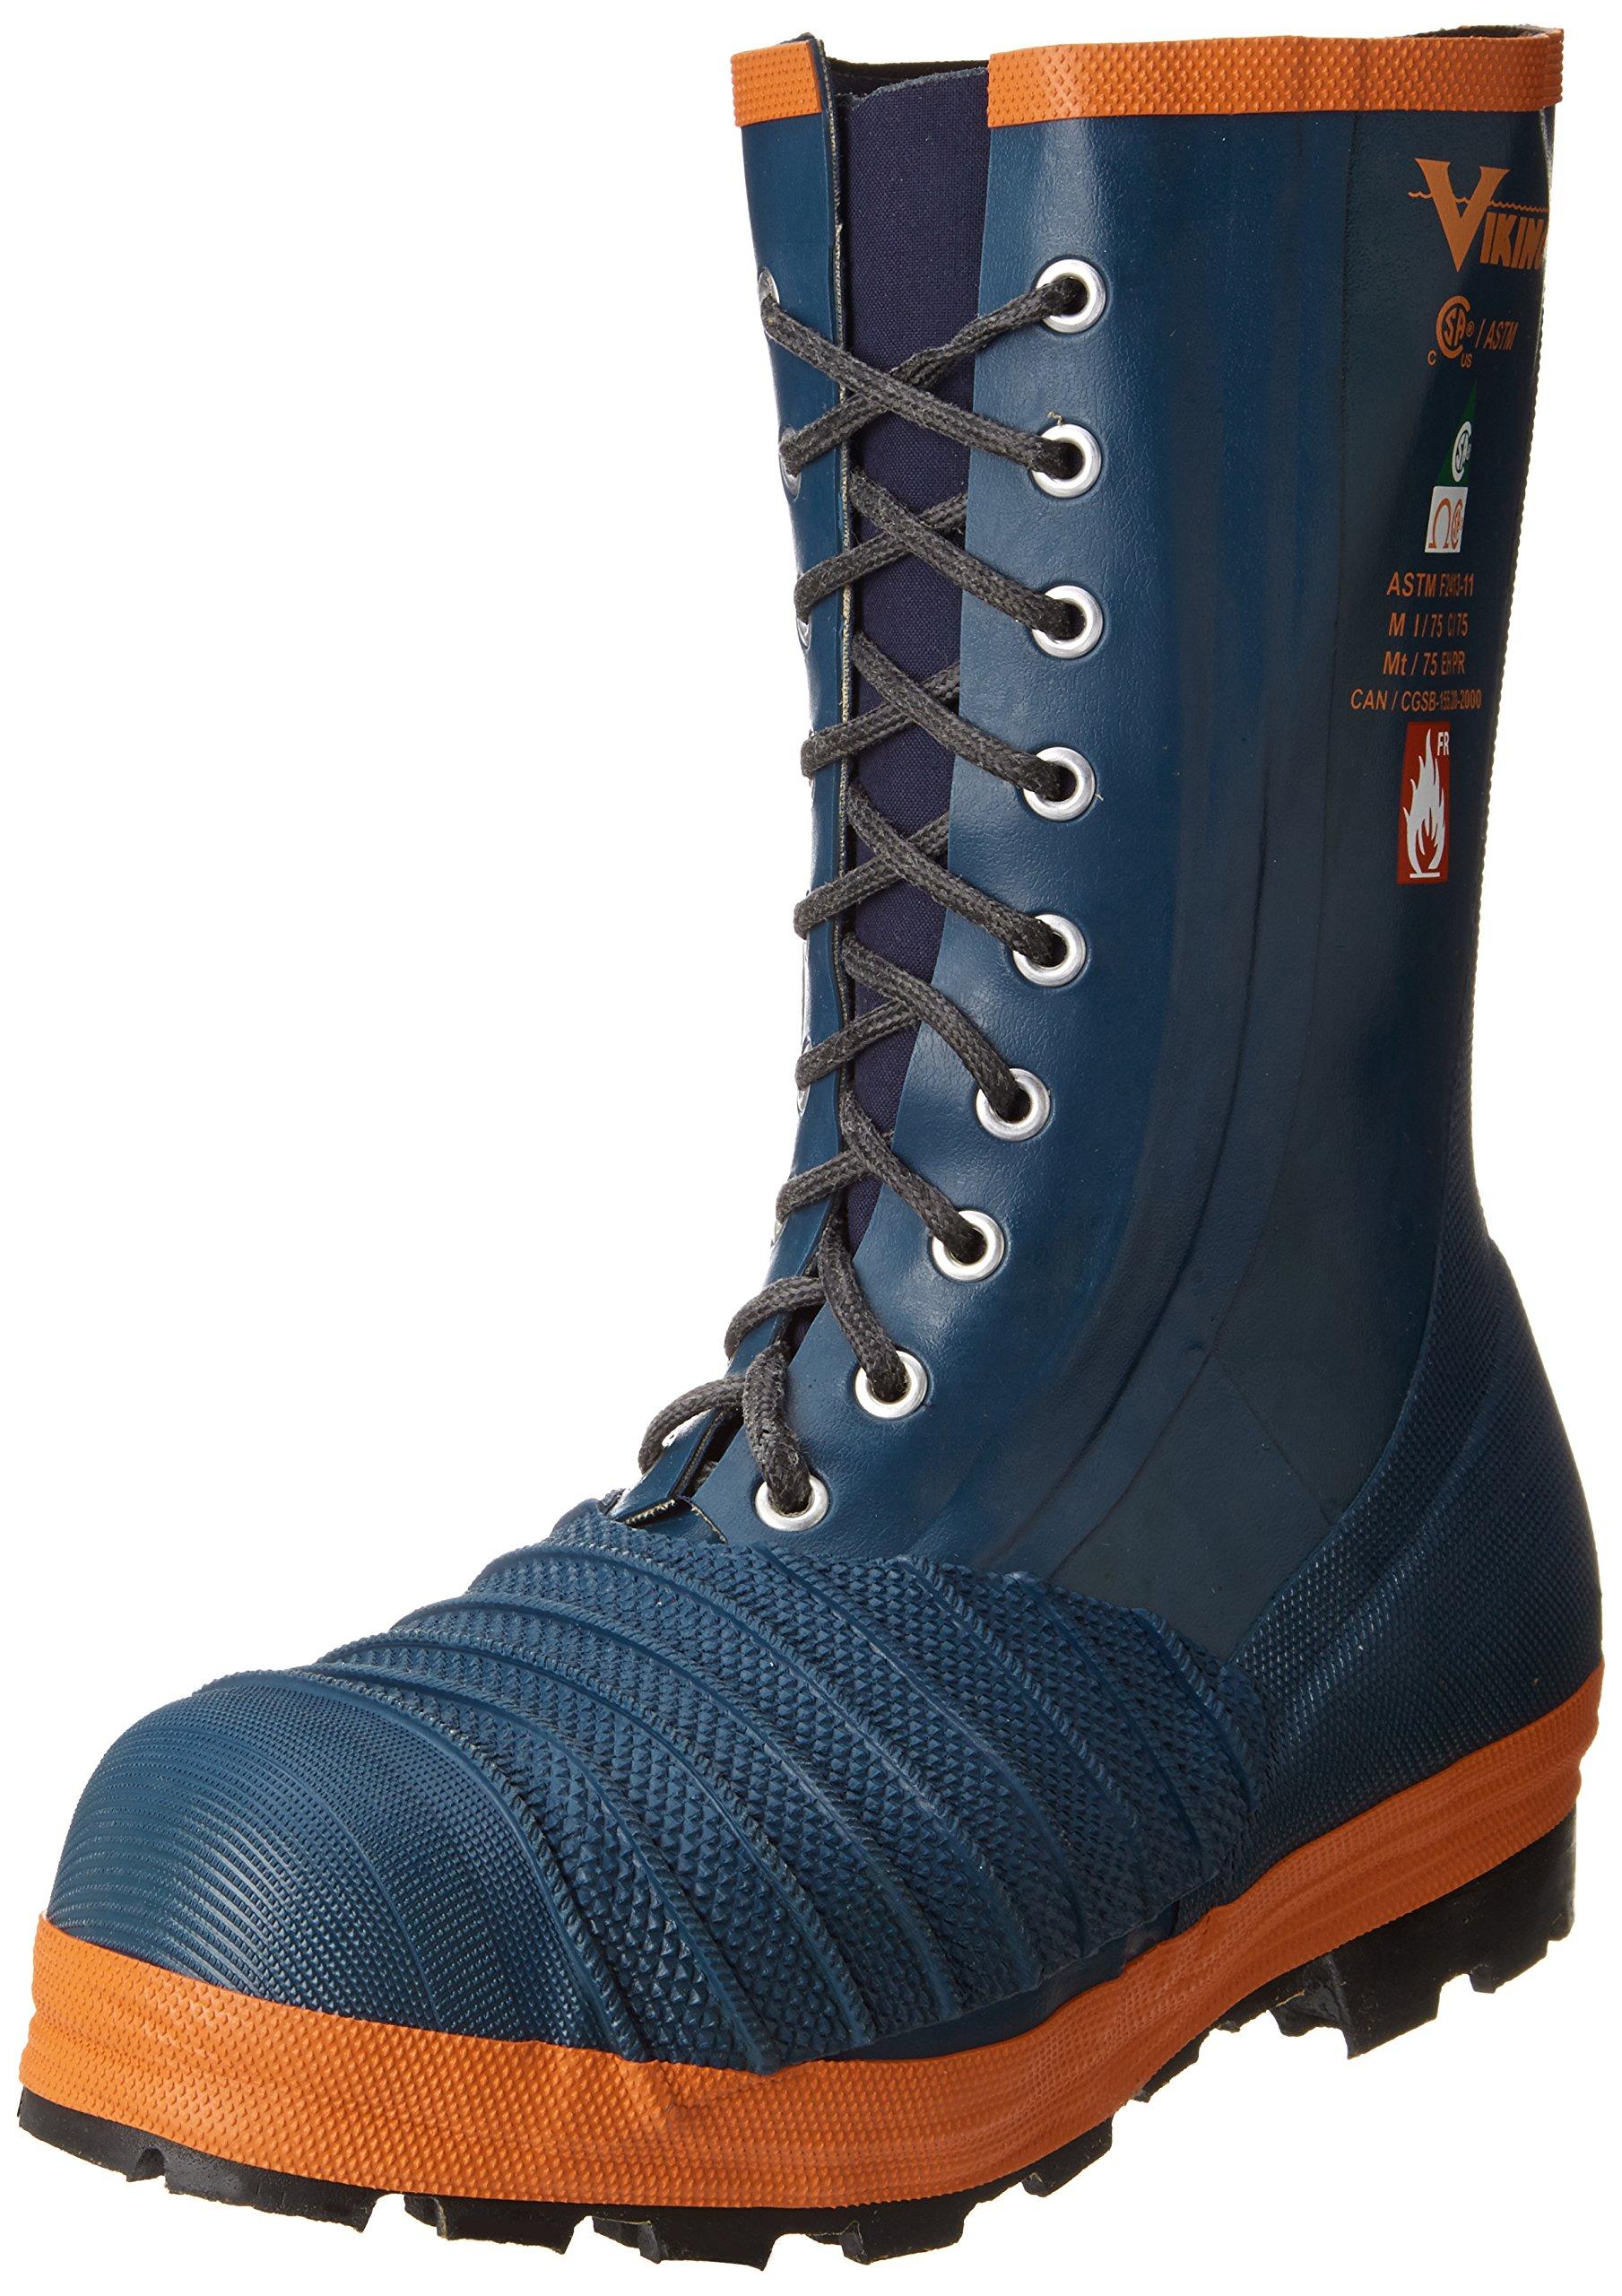 Viking Footwear Rigger Firewall FR-S/T&P Fire Resistant Boot, Blue/Orange, 7 M US